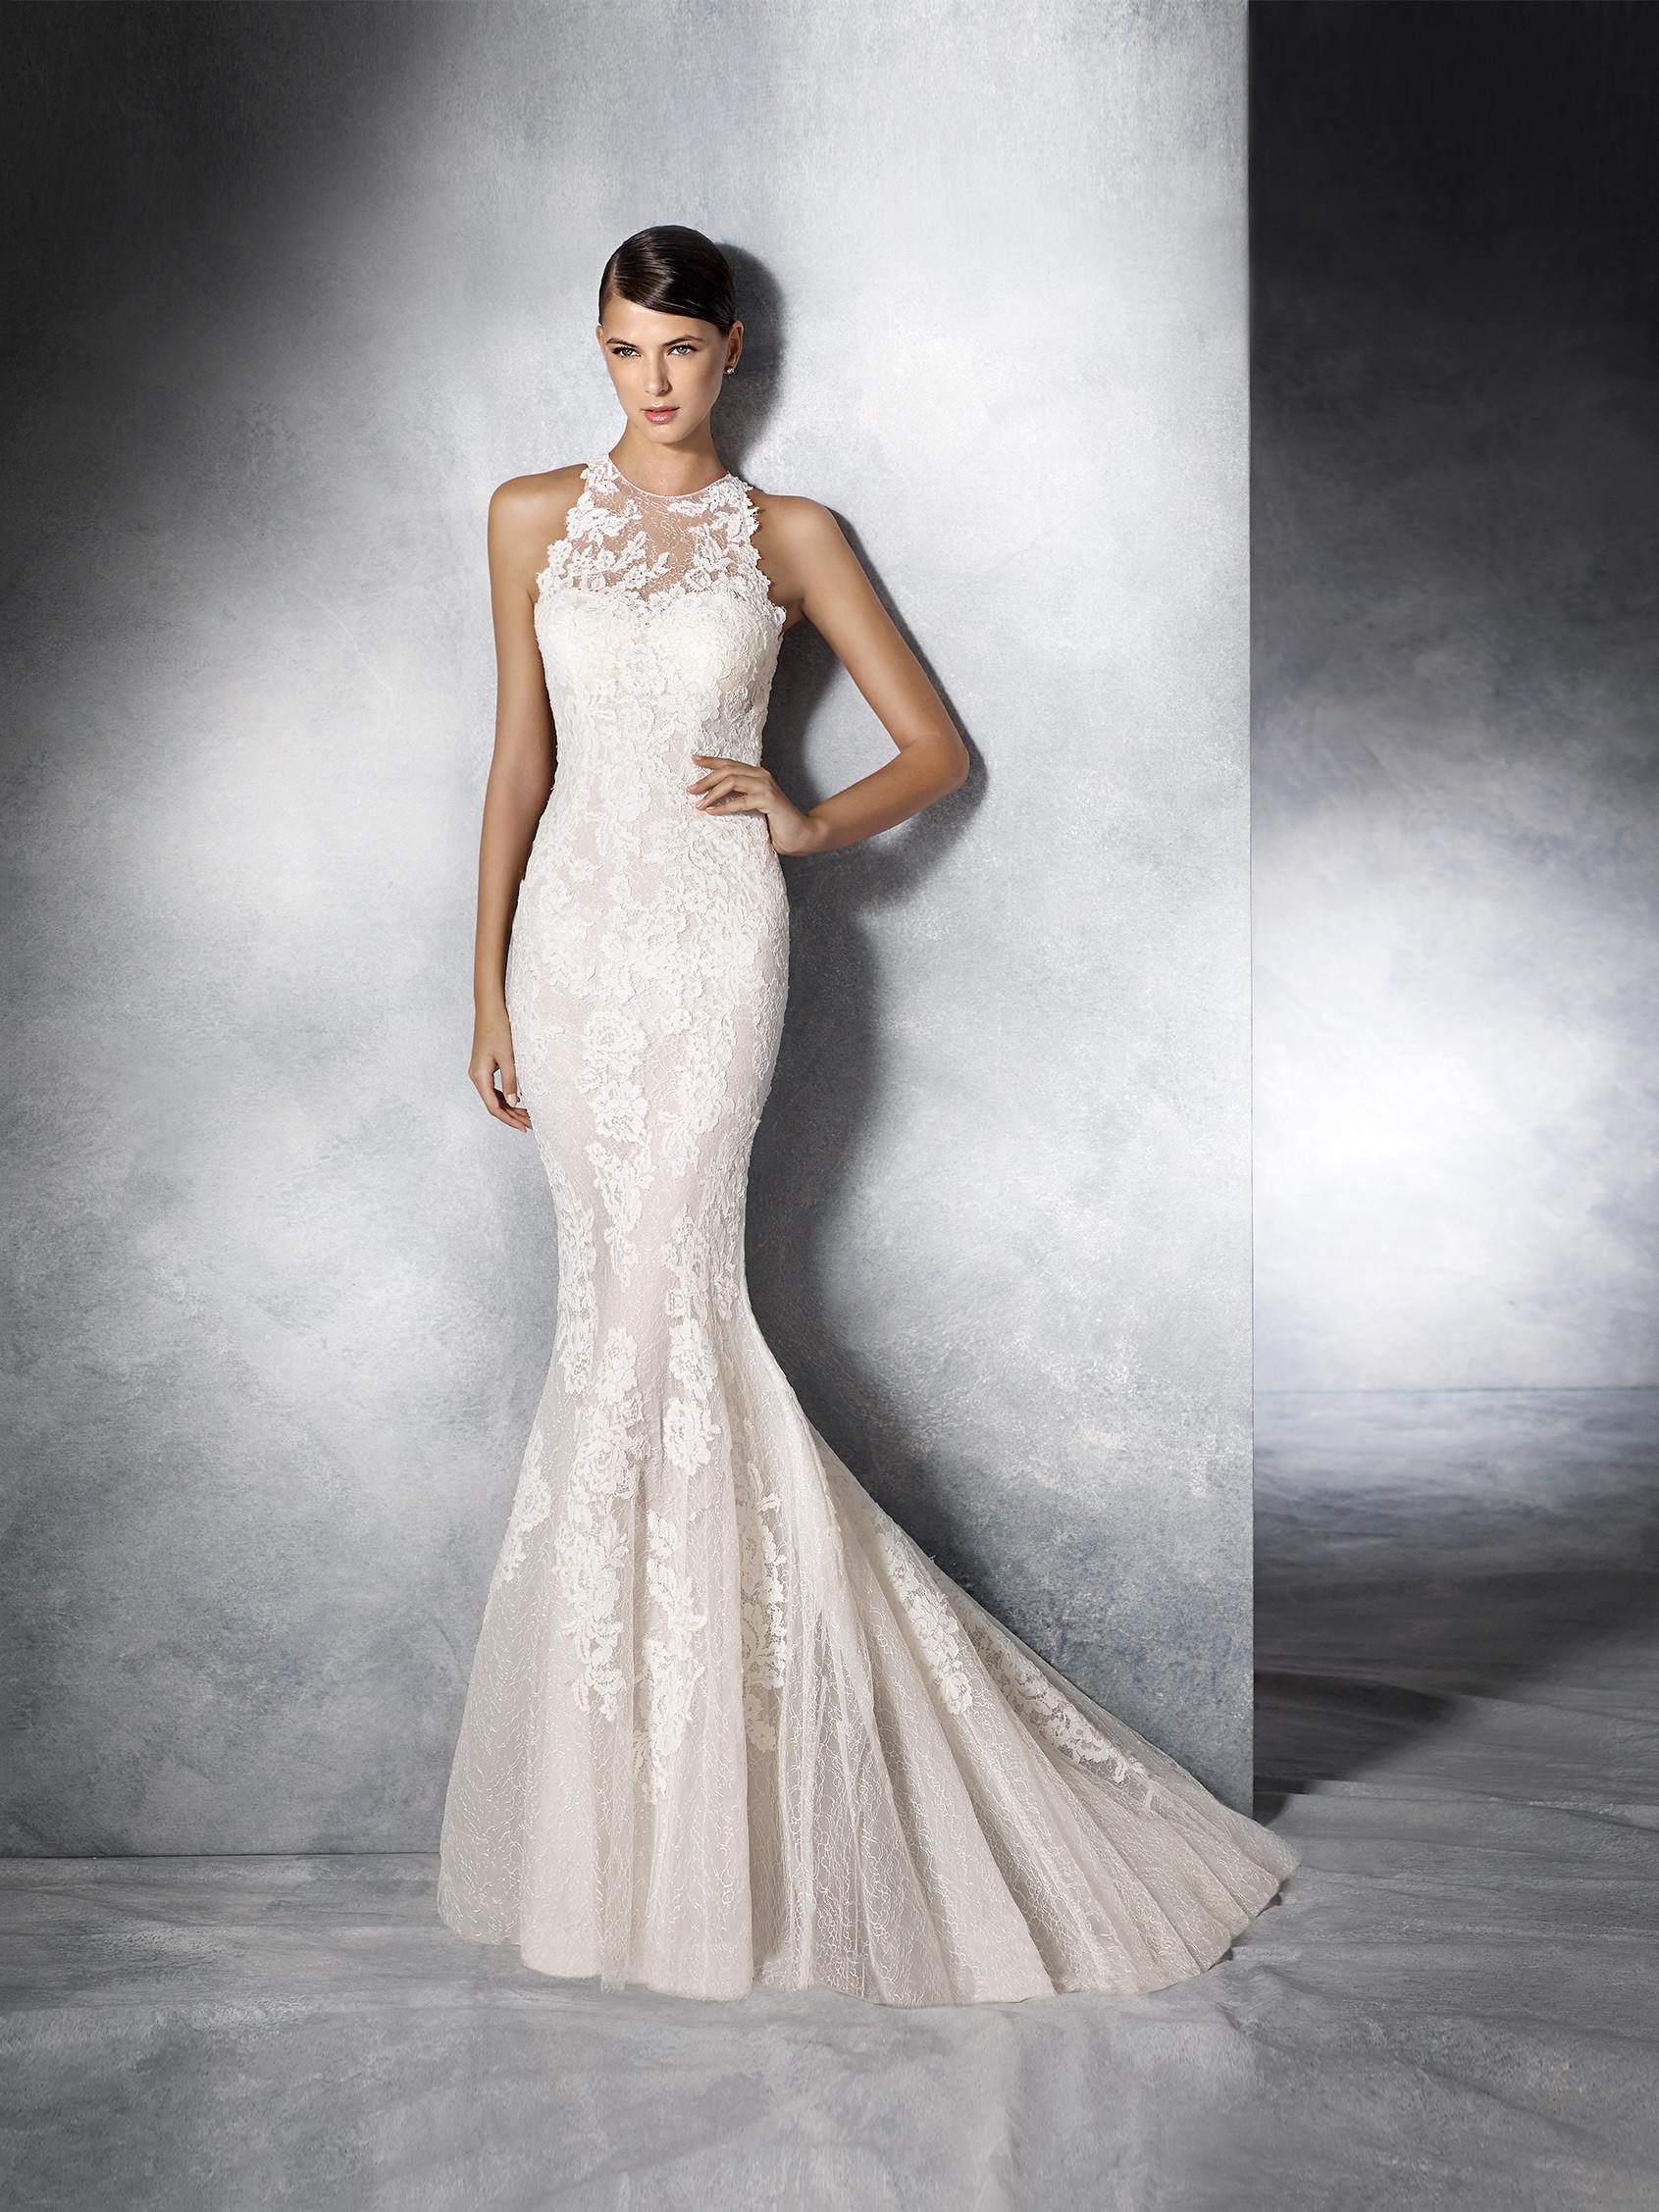 Brautkleid-jensen_b